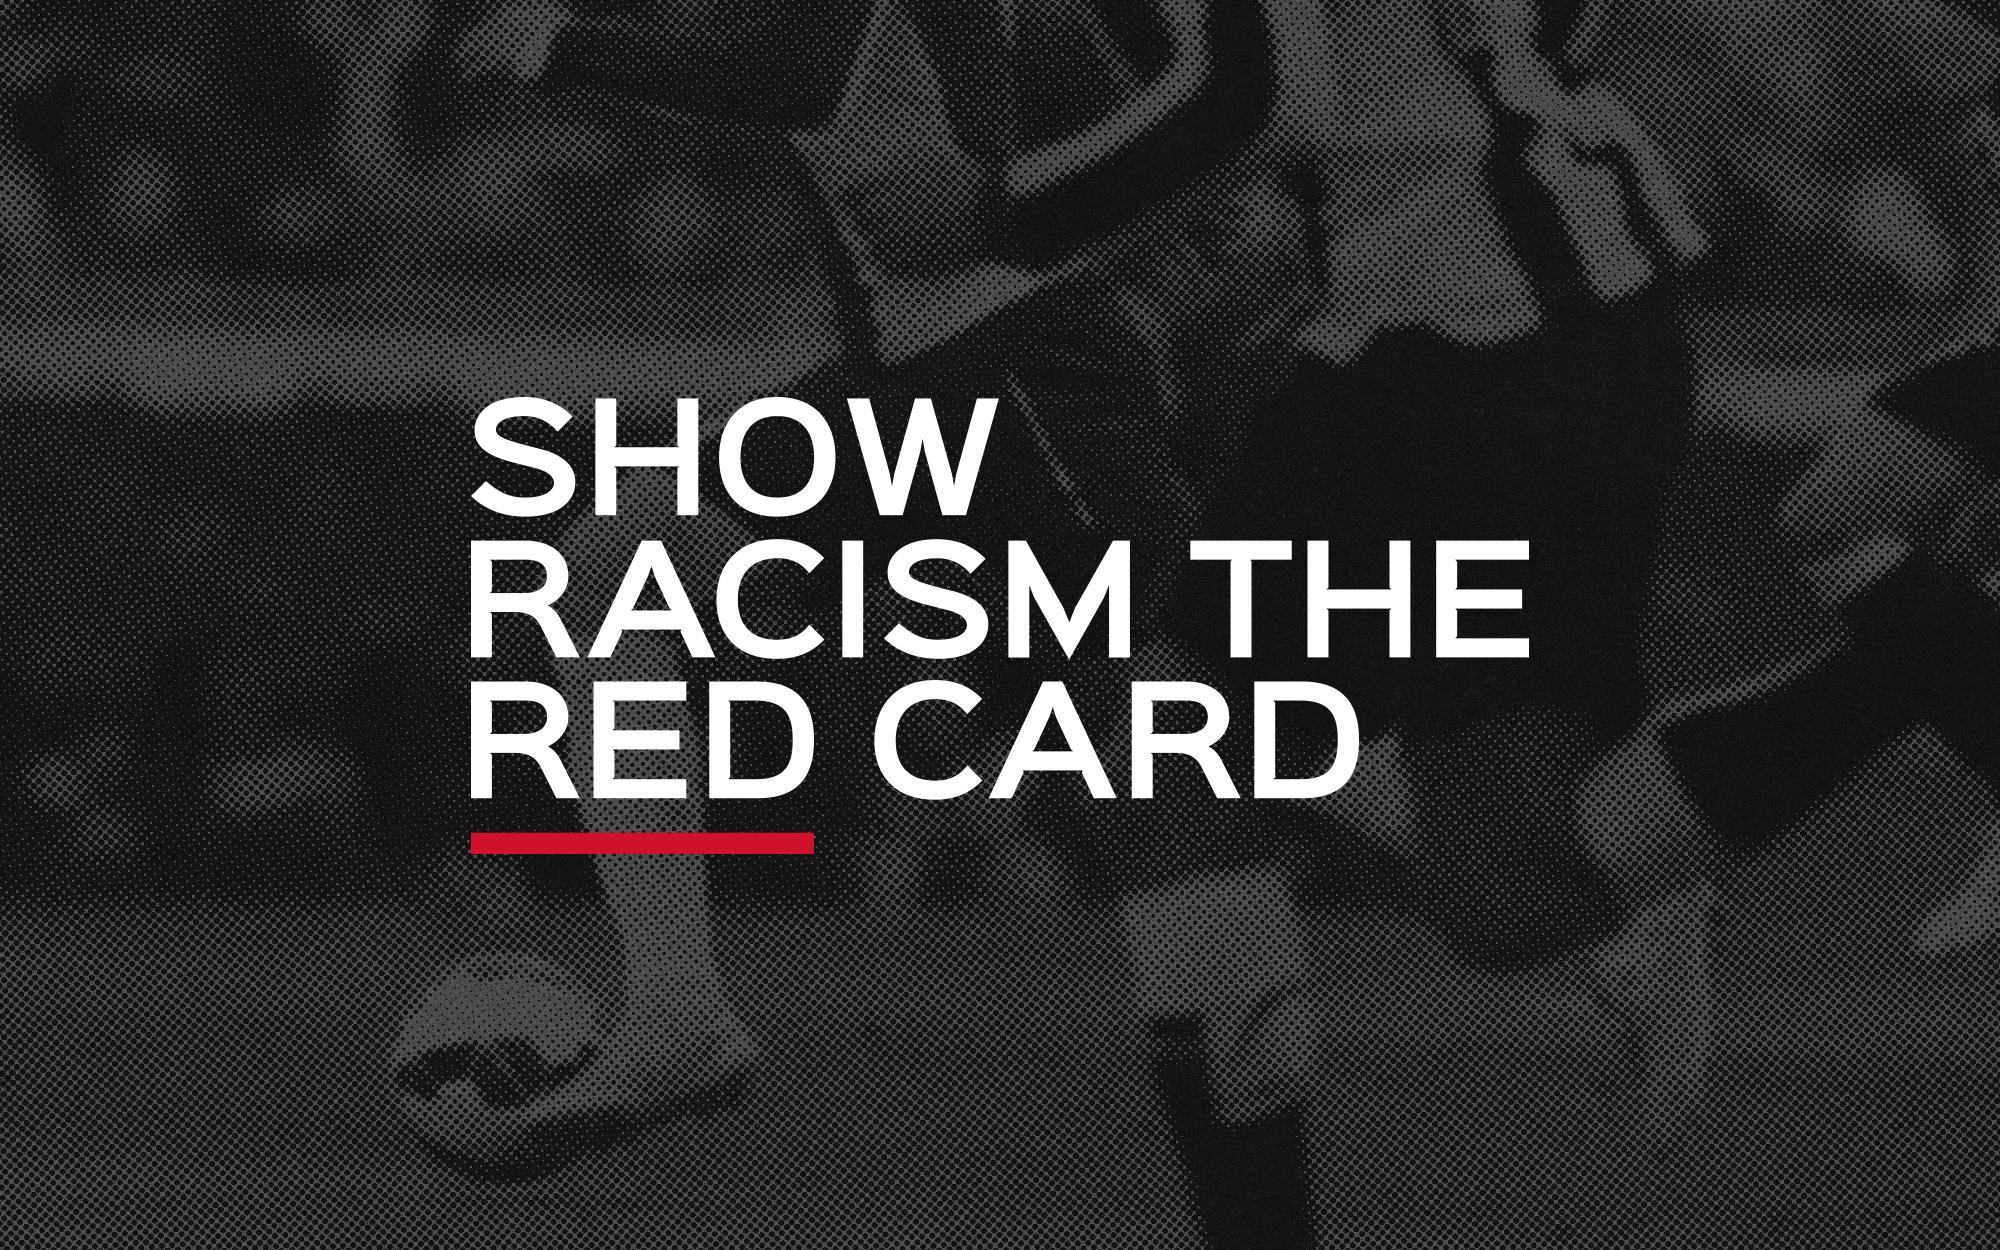 logo-design-graphic-glasgow-show-racism-the-red-card-walnut-wasp.jpg